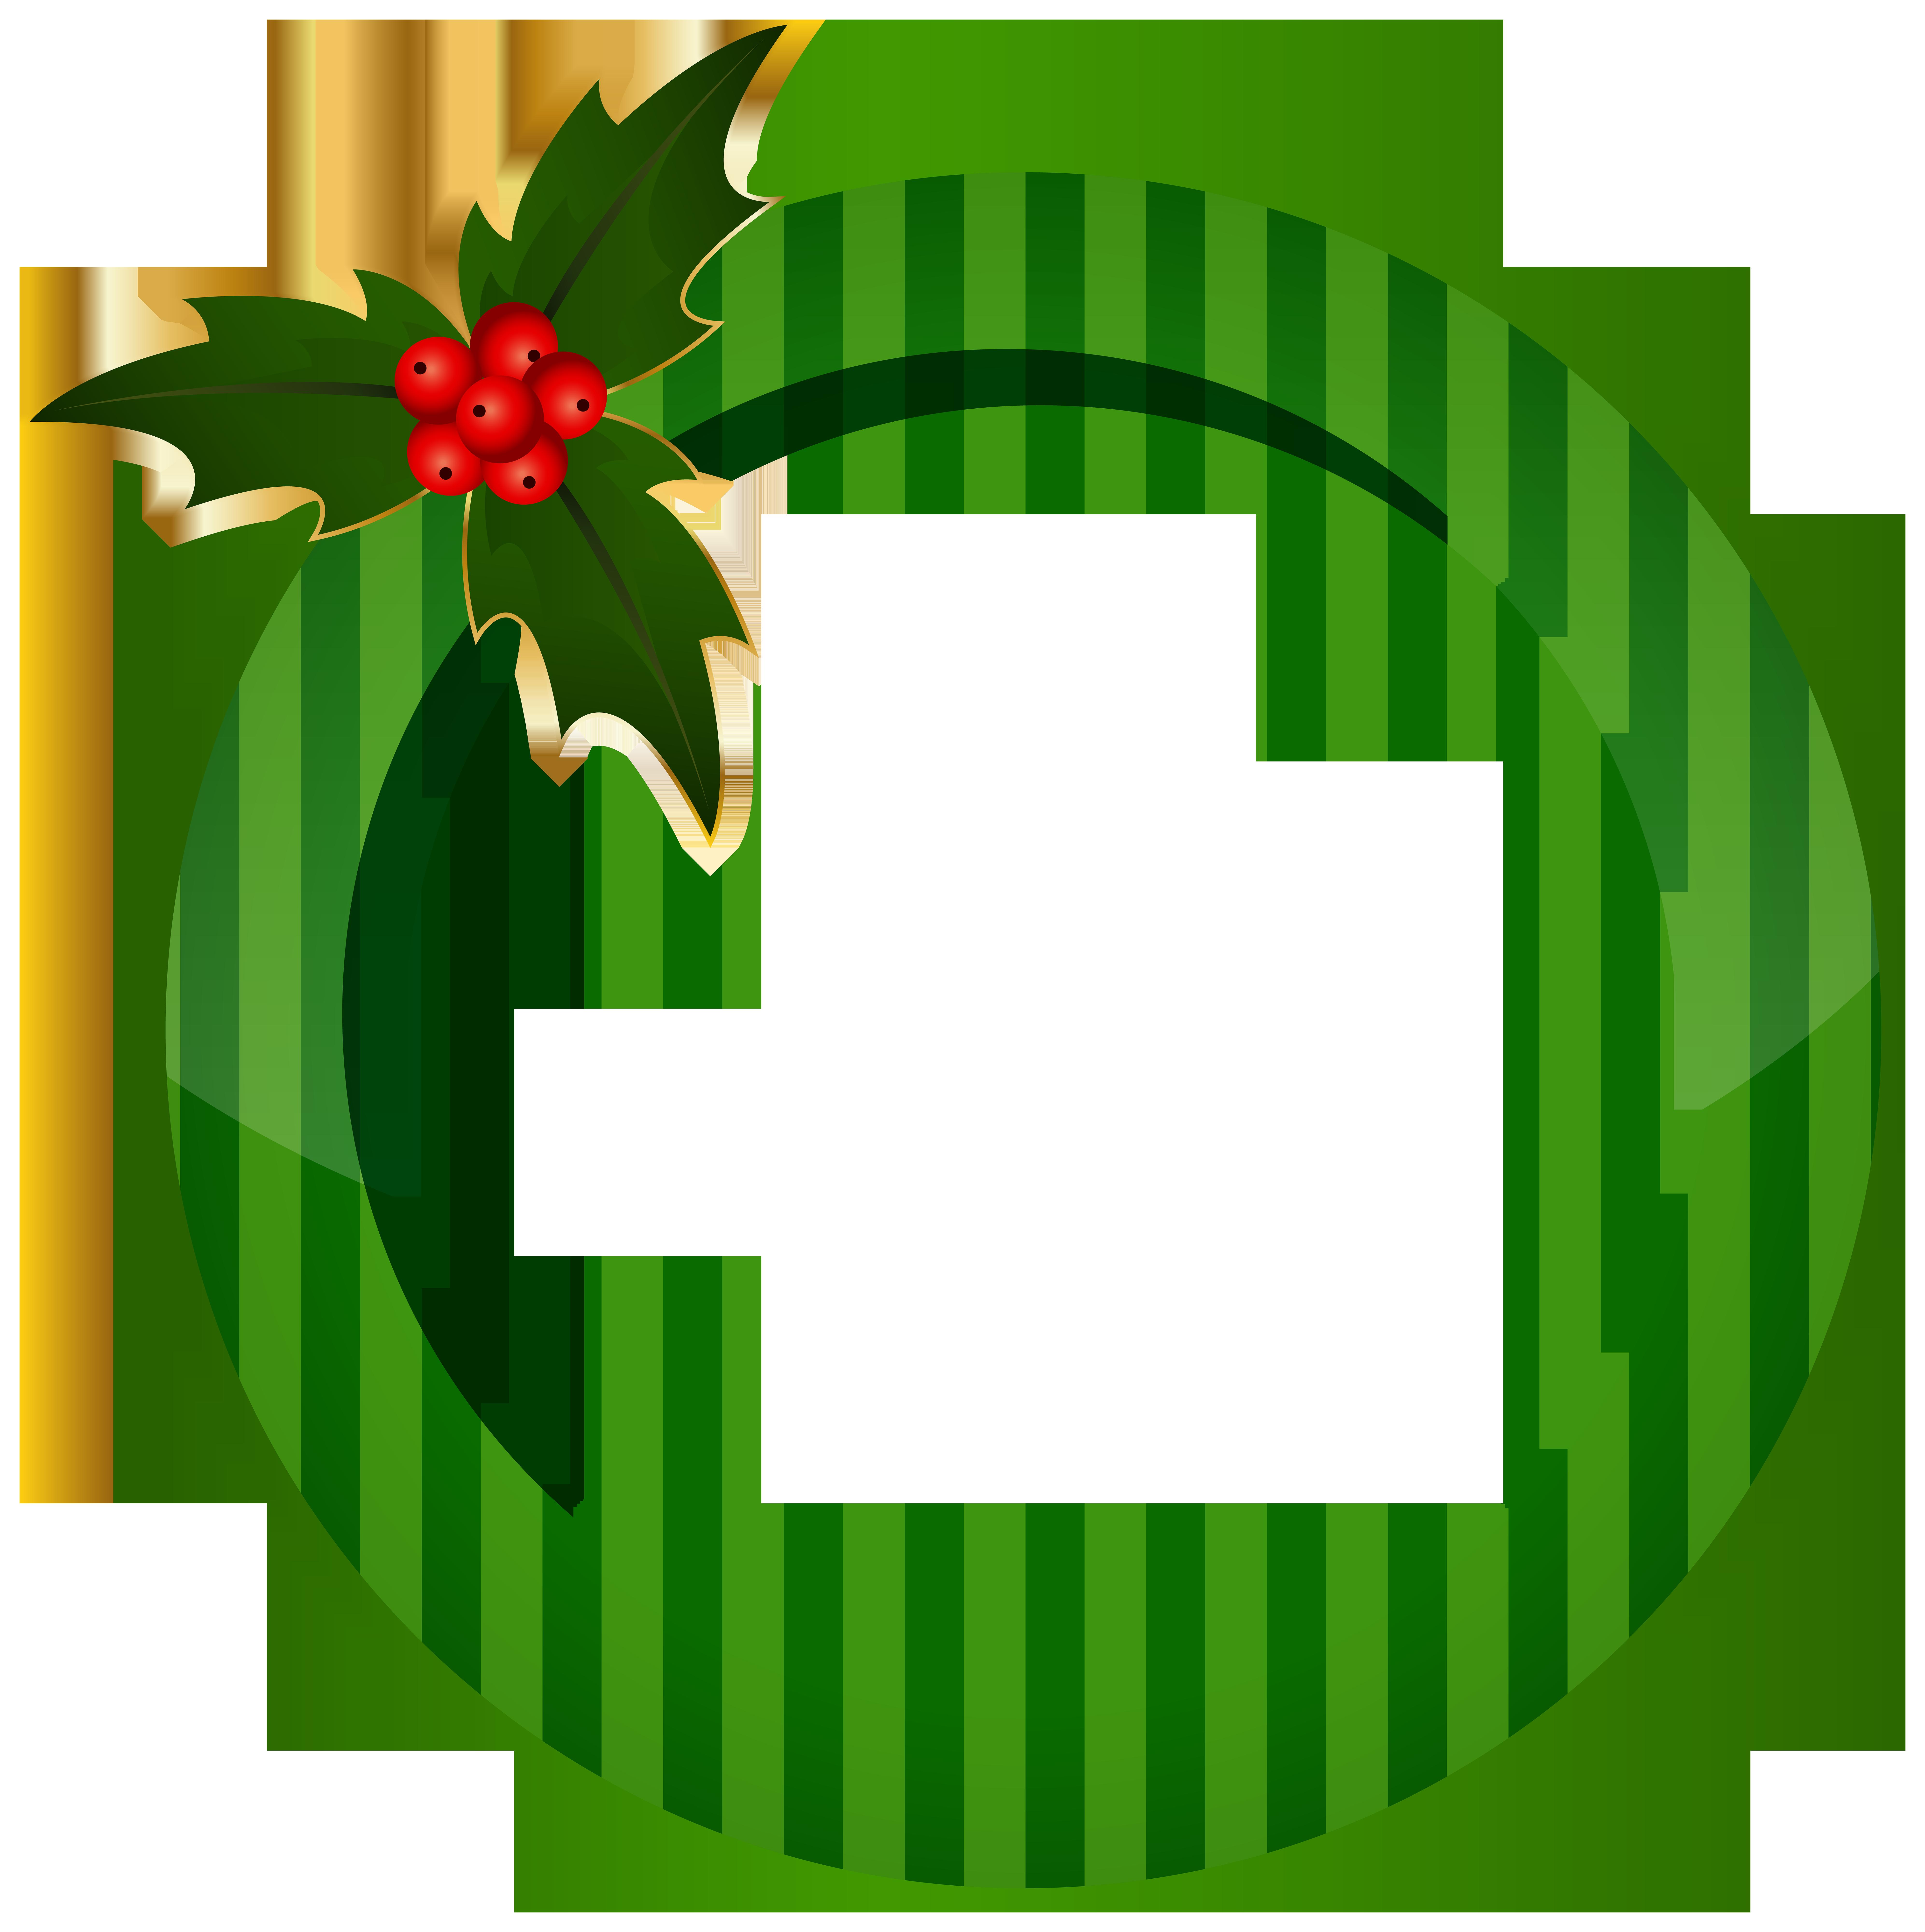 Grain clipart circle. Christmas round green frame